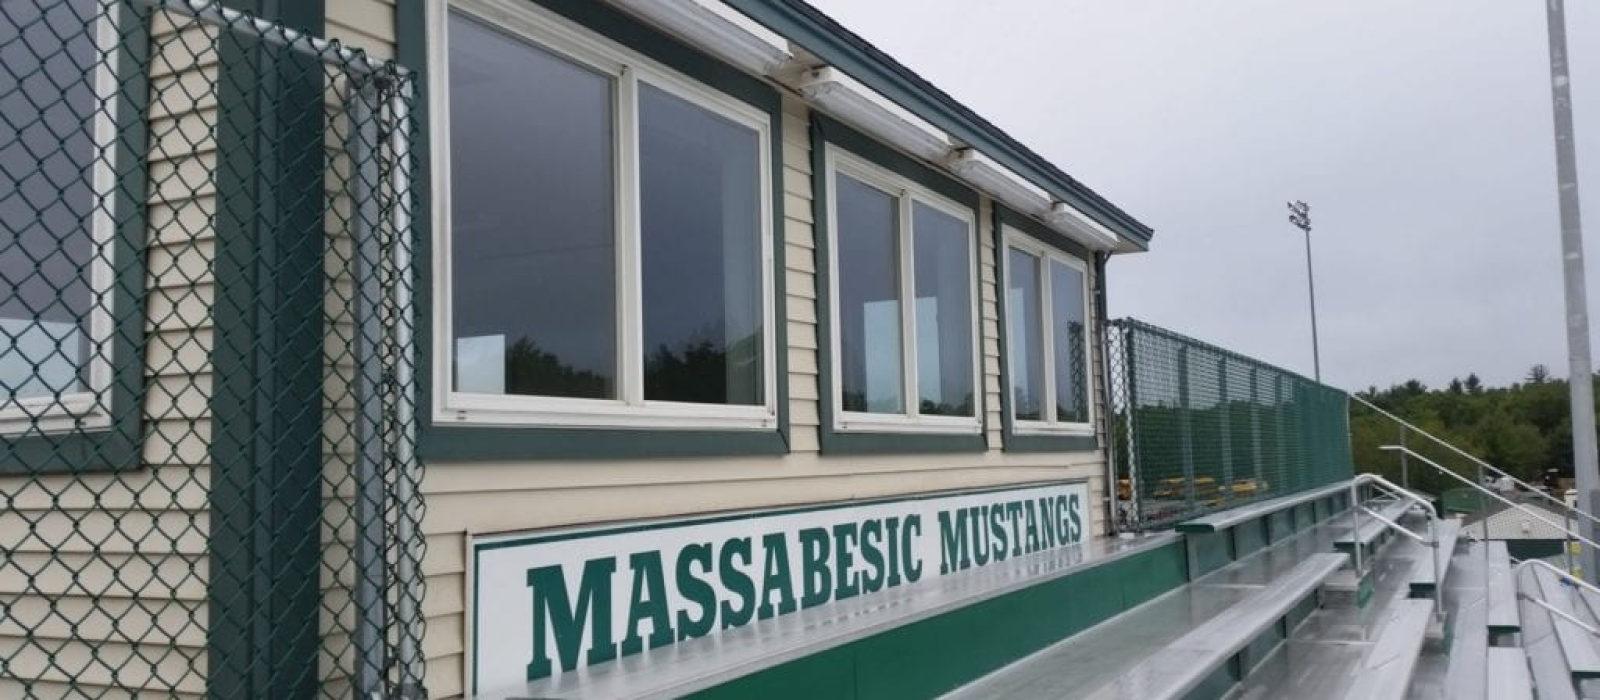 Massabesic Mustangs At Waterboro Rsu 57 Athletic Complex